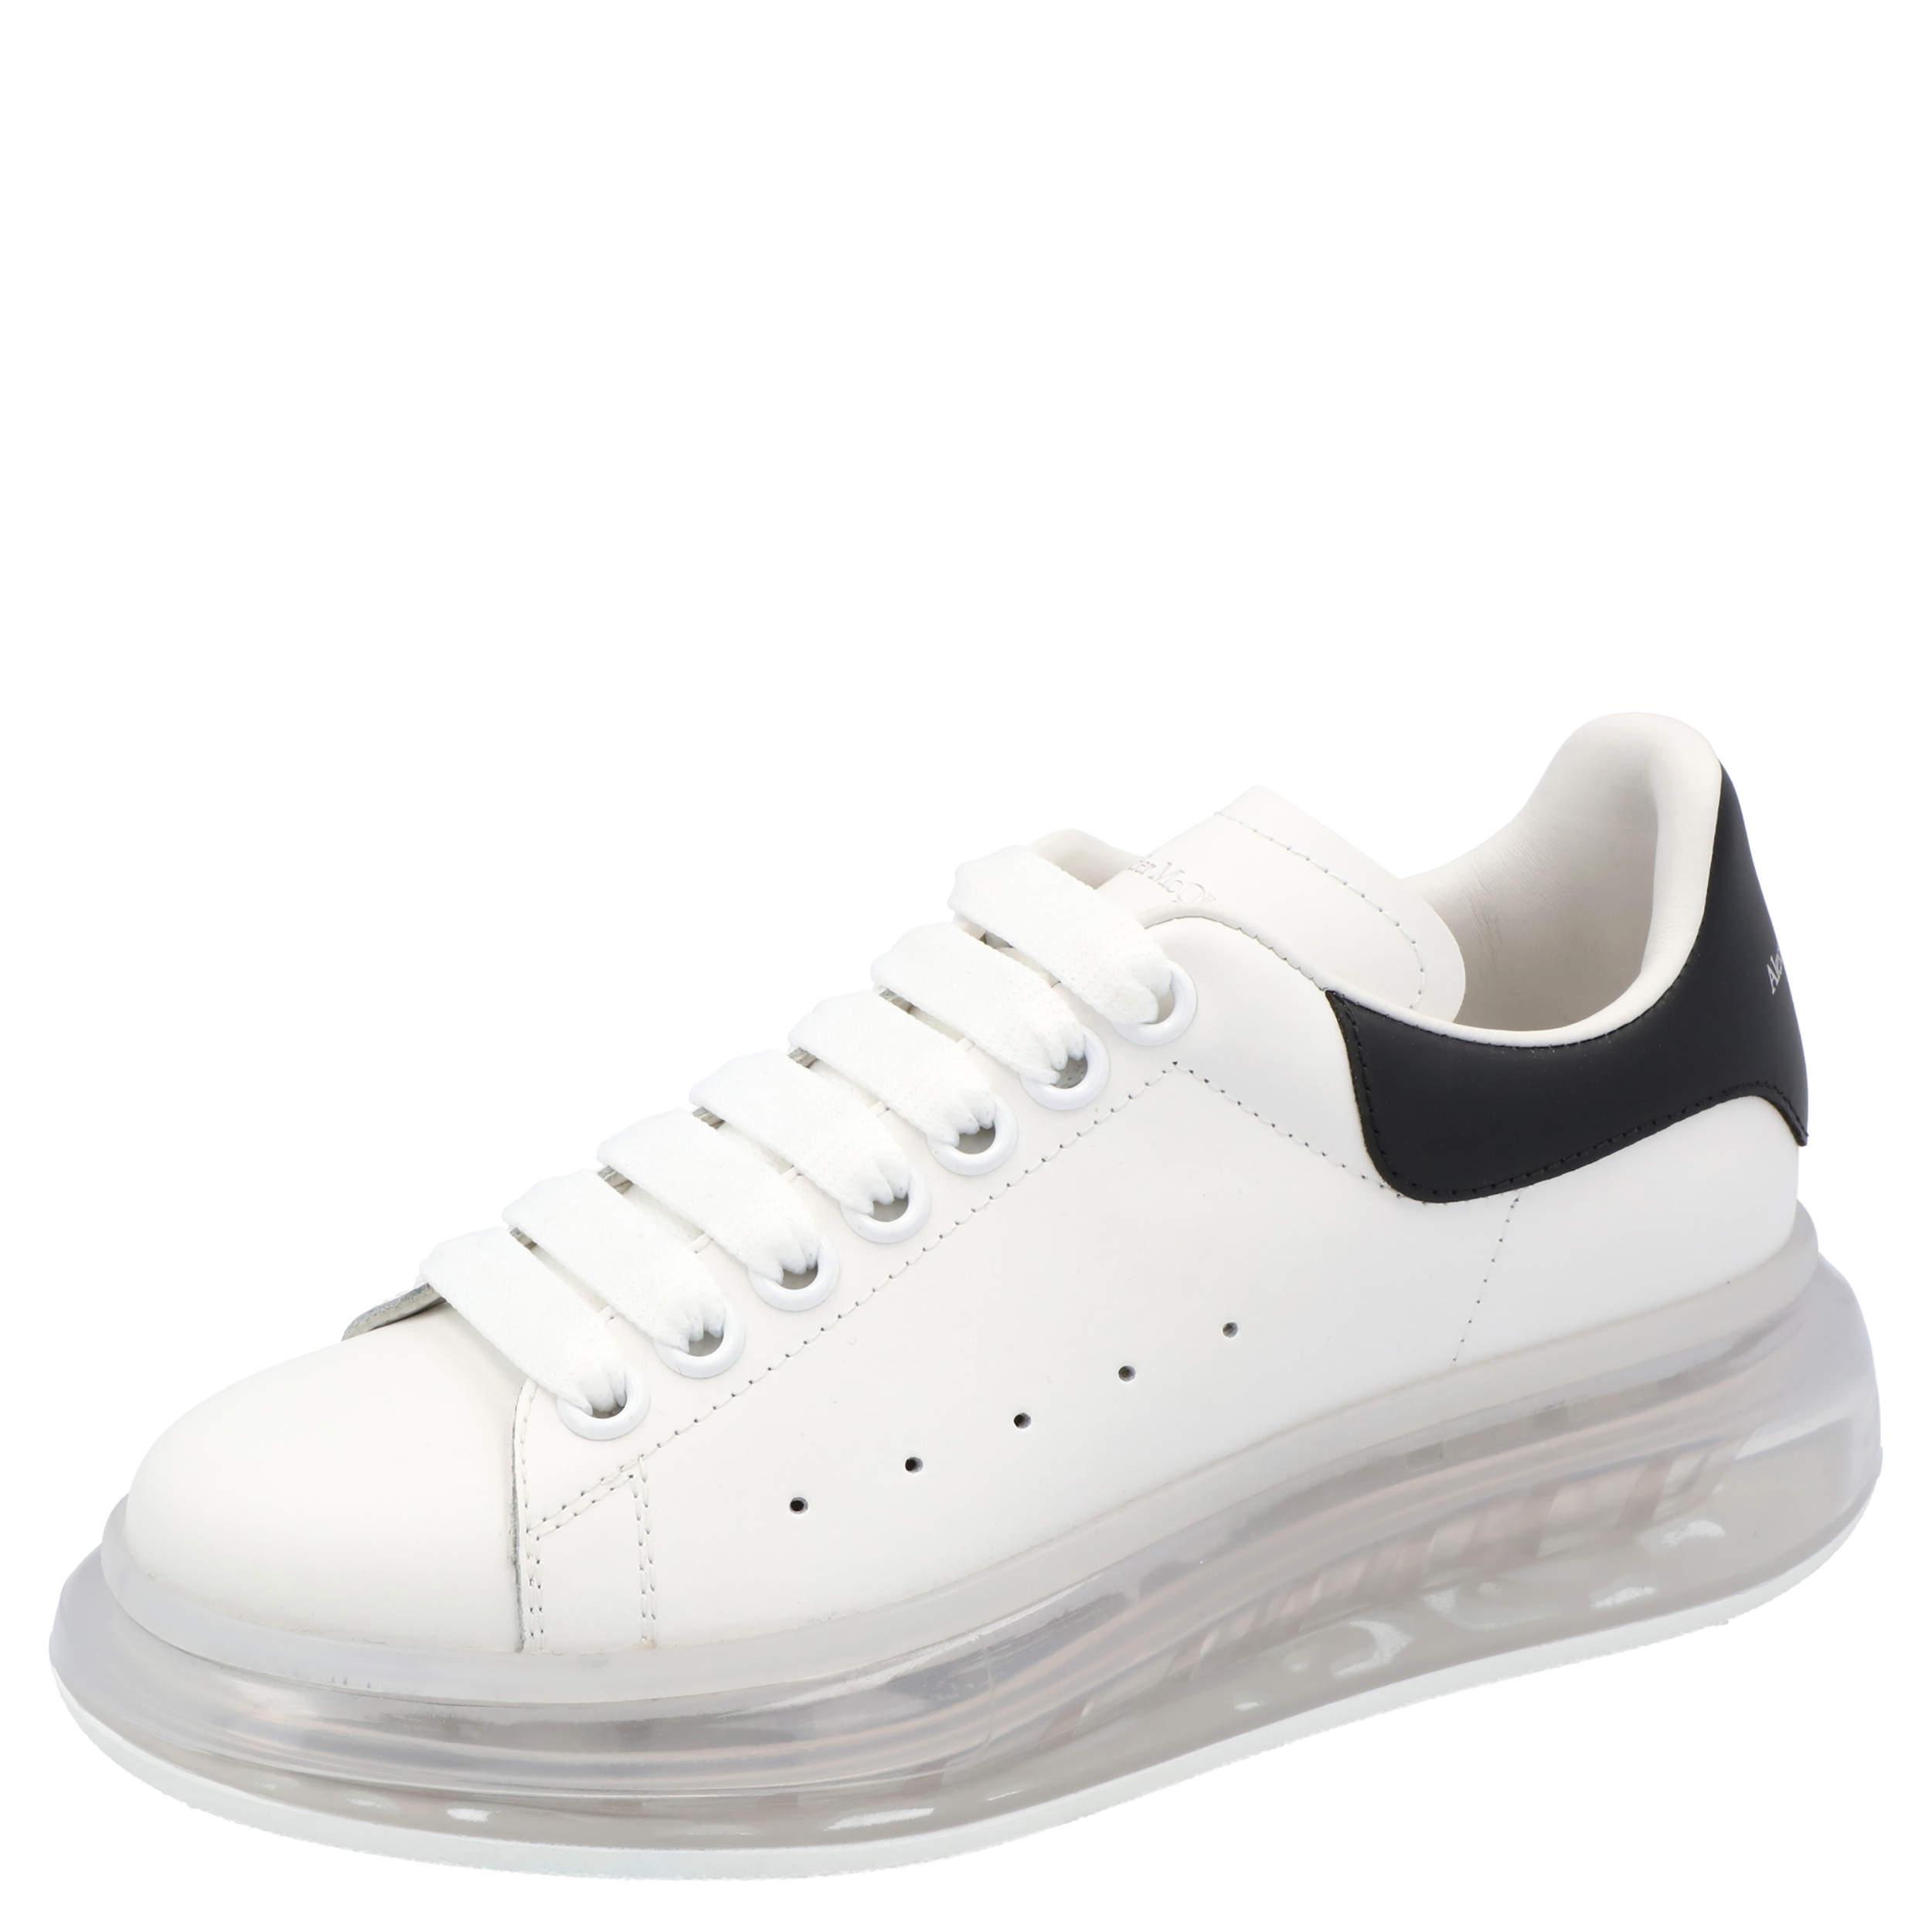 Alexander McQueen White Oversized Sneakers Size EU 36.5